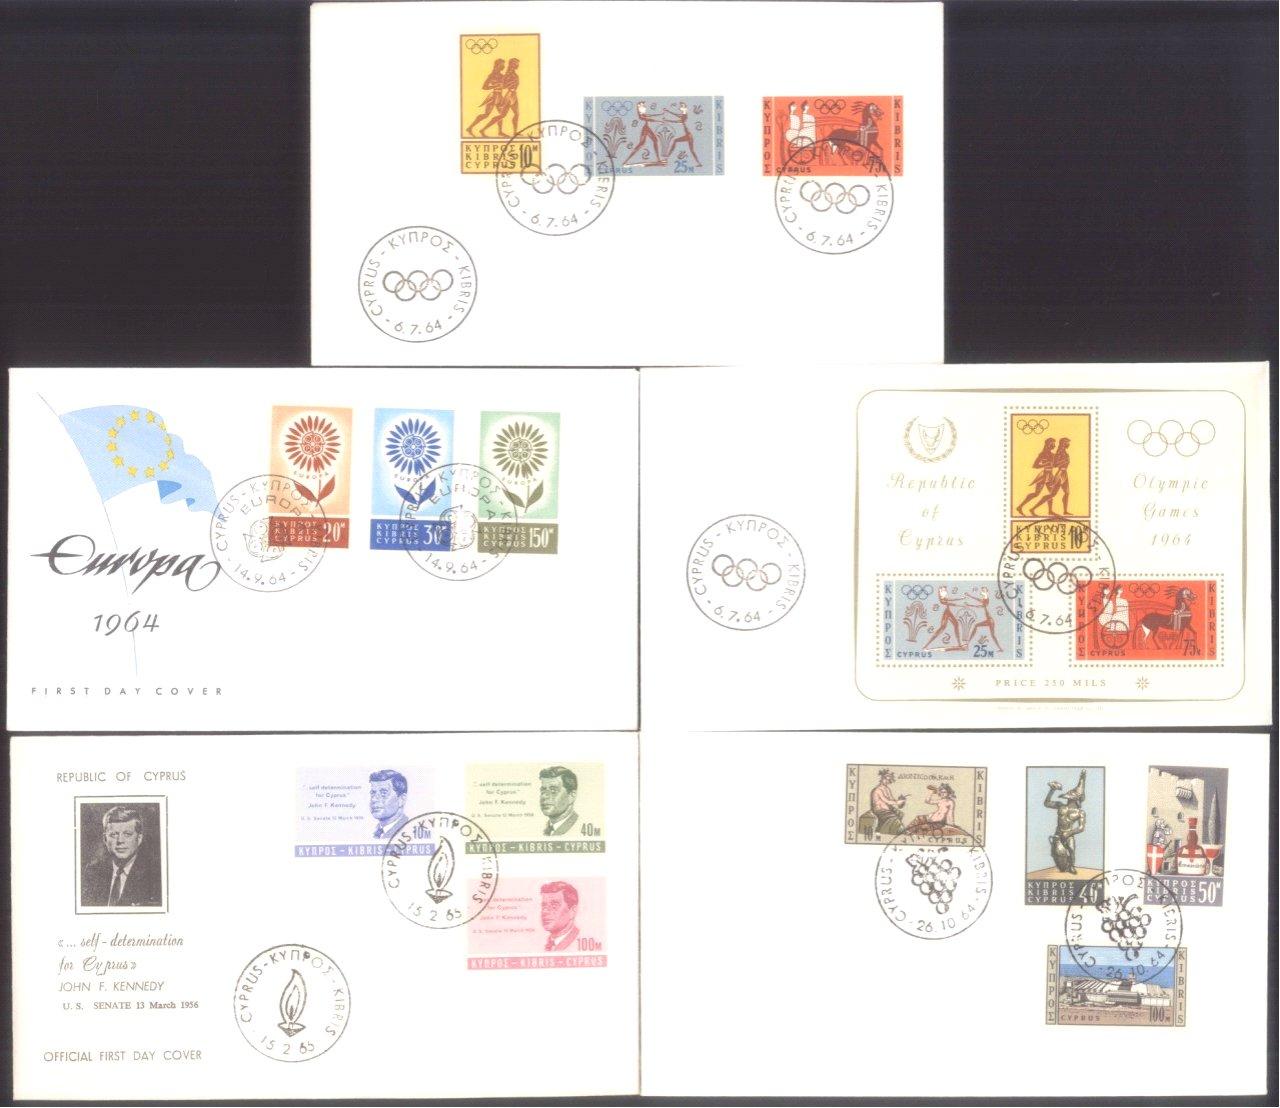 ZYPERN 1964/65, KATALOGWERT 177 EURO, Ersttagsbriefesammlung